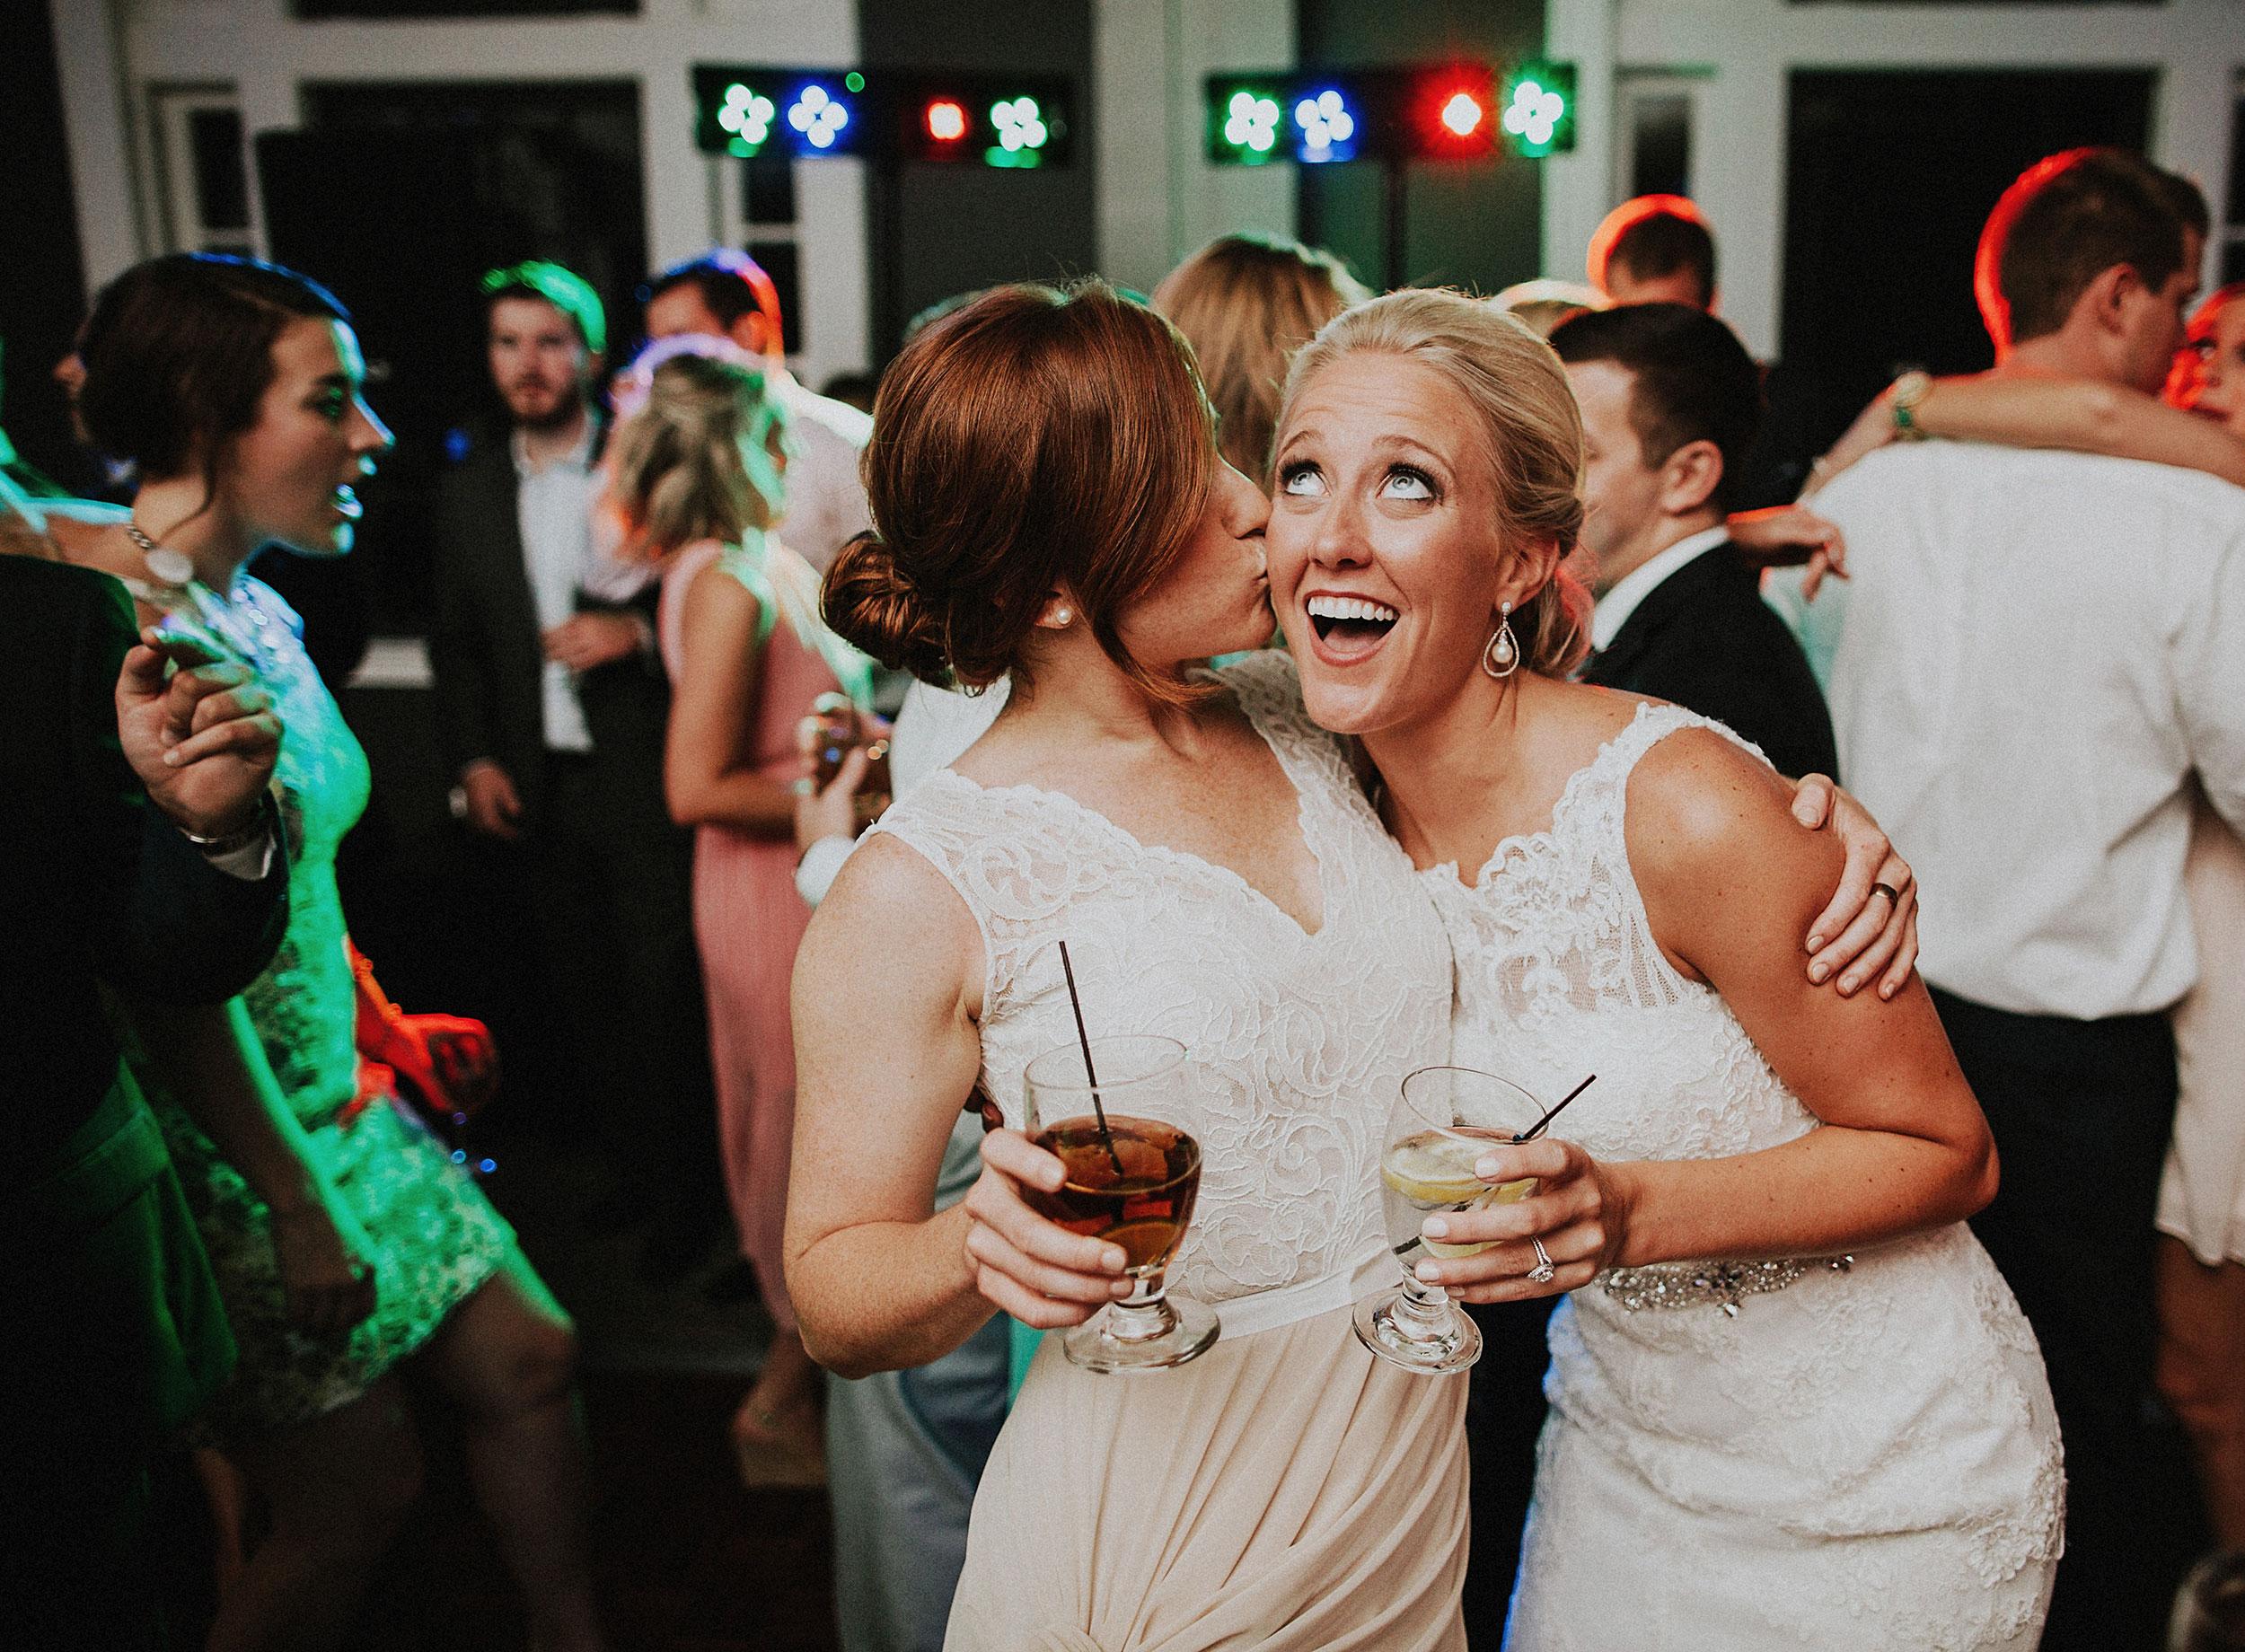 olmsted-wedding-louisville-kentucky-051.JPG